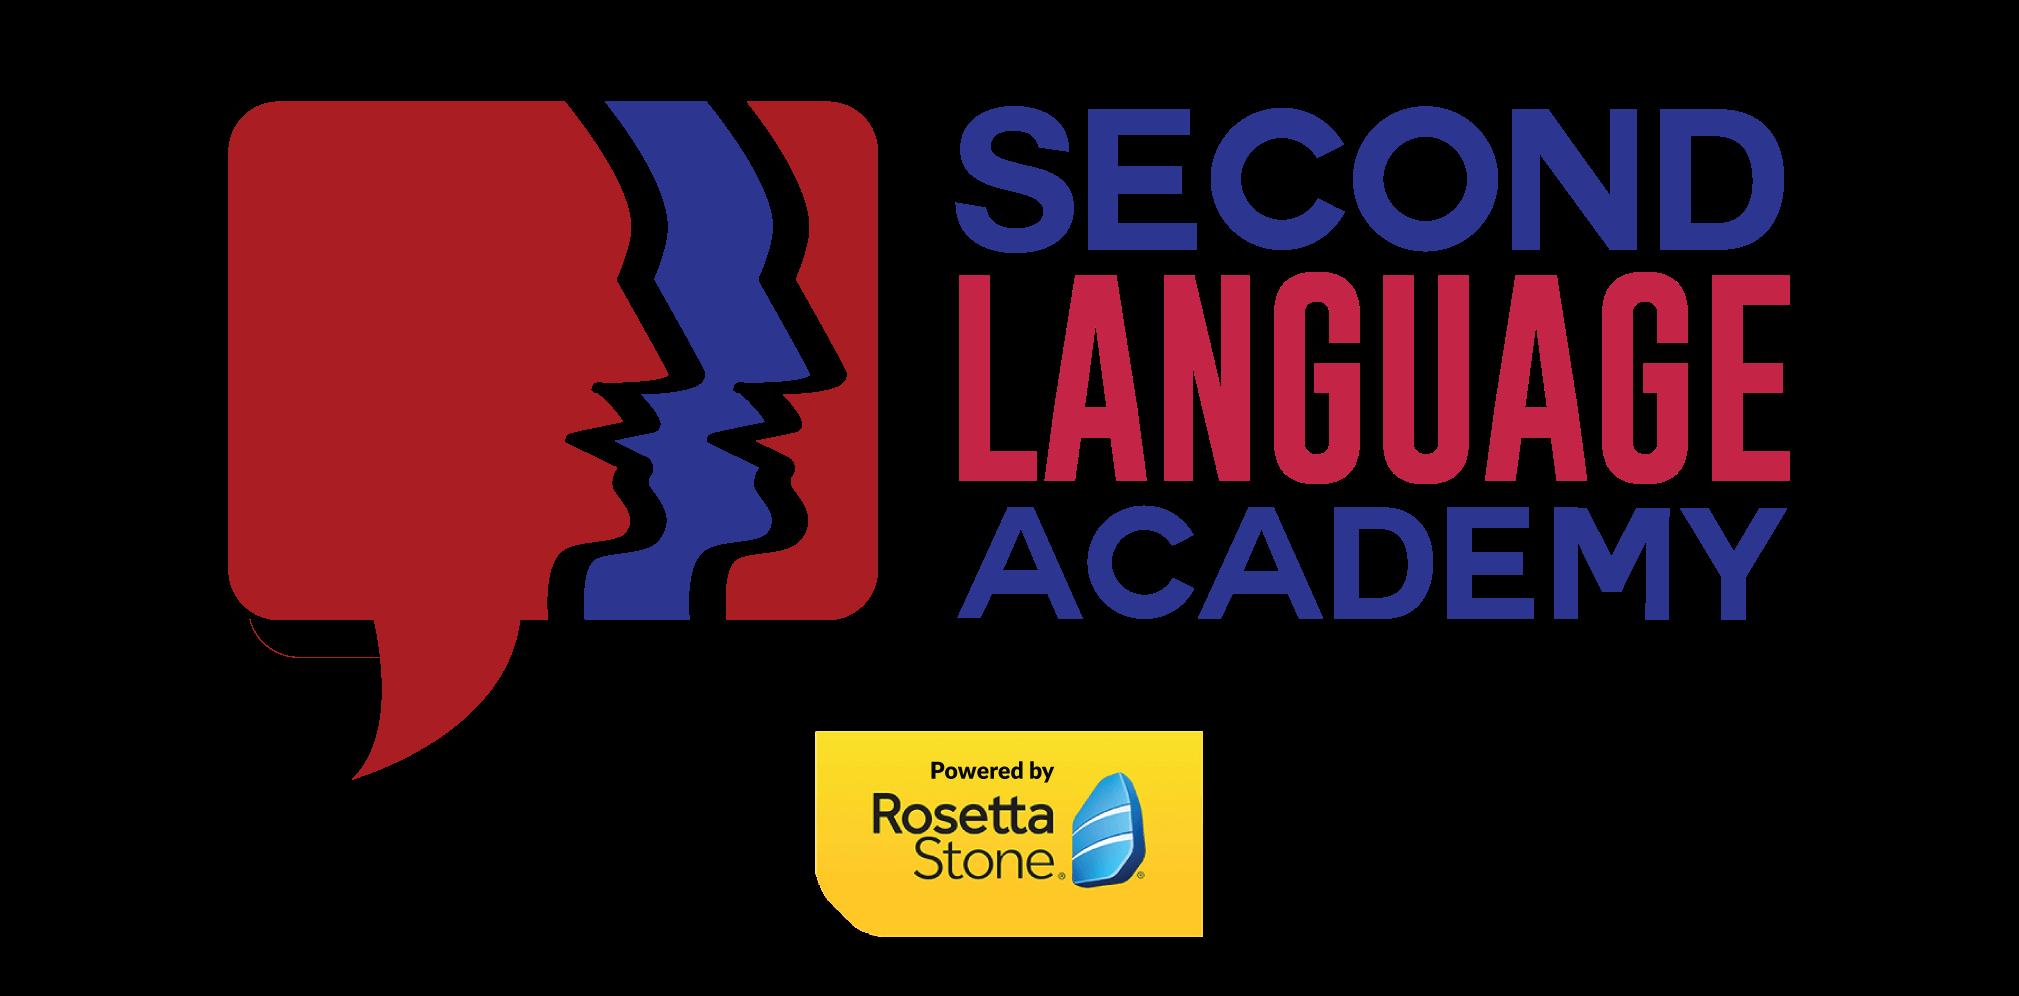 Second Language Academy